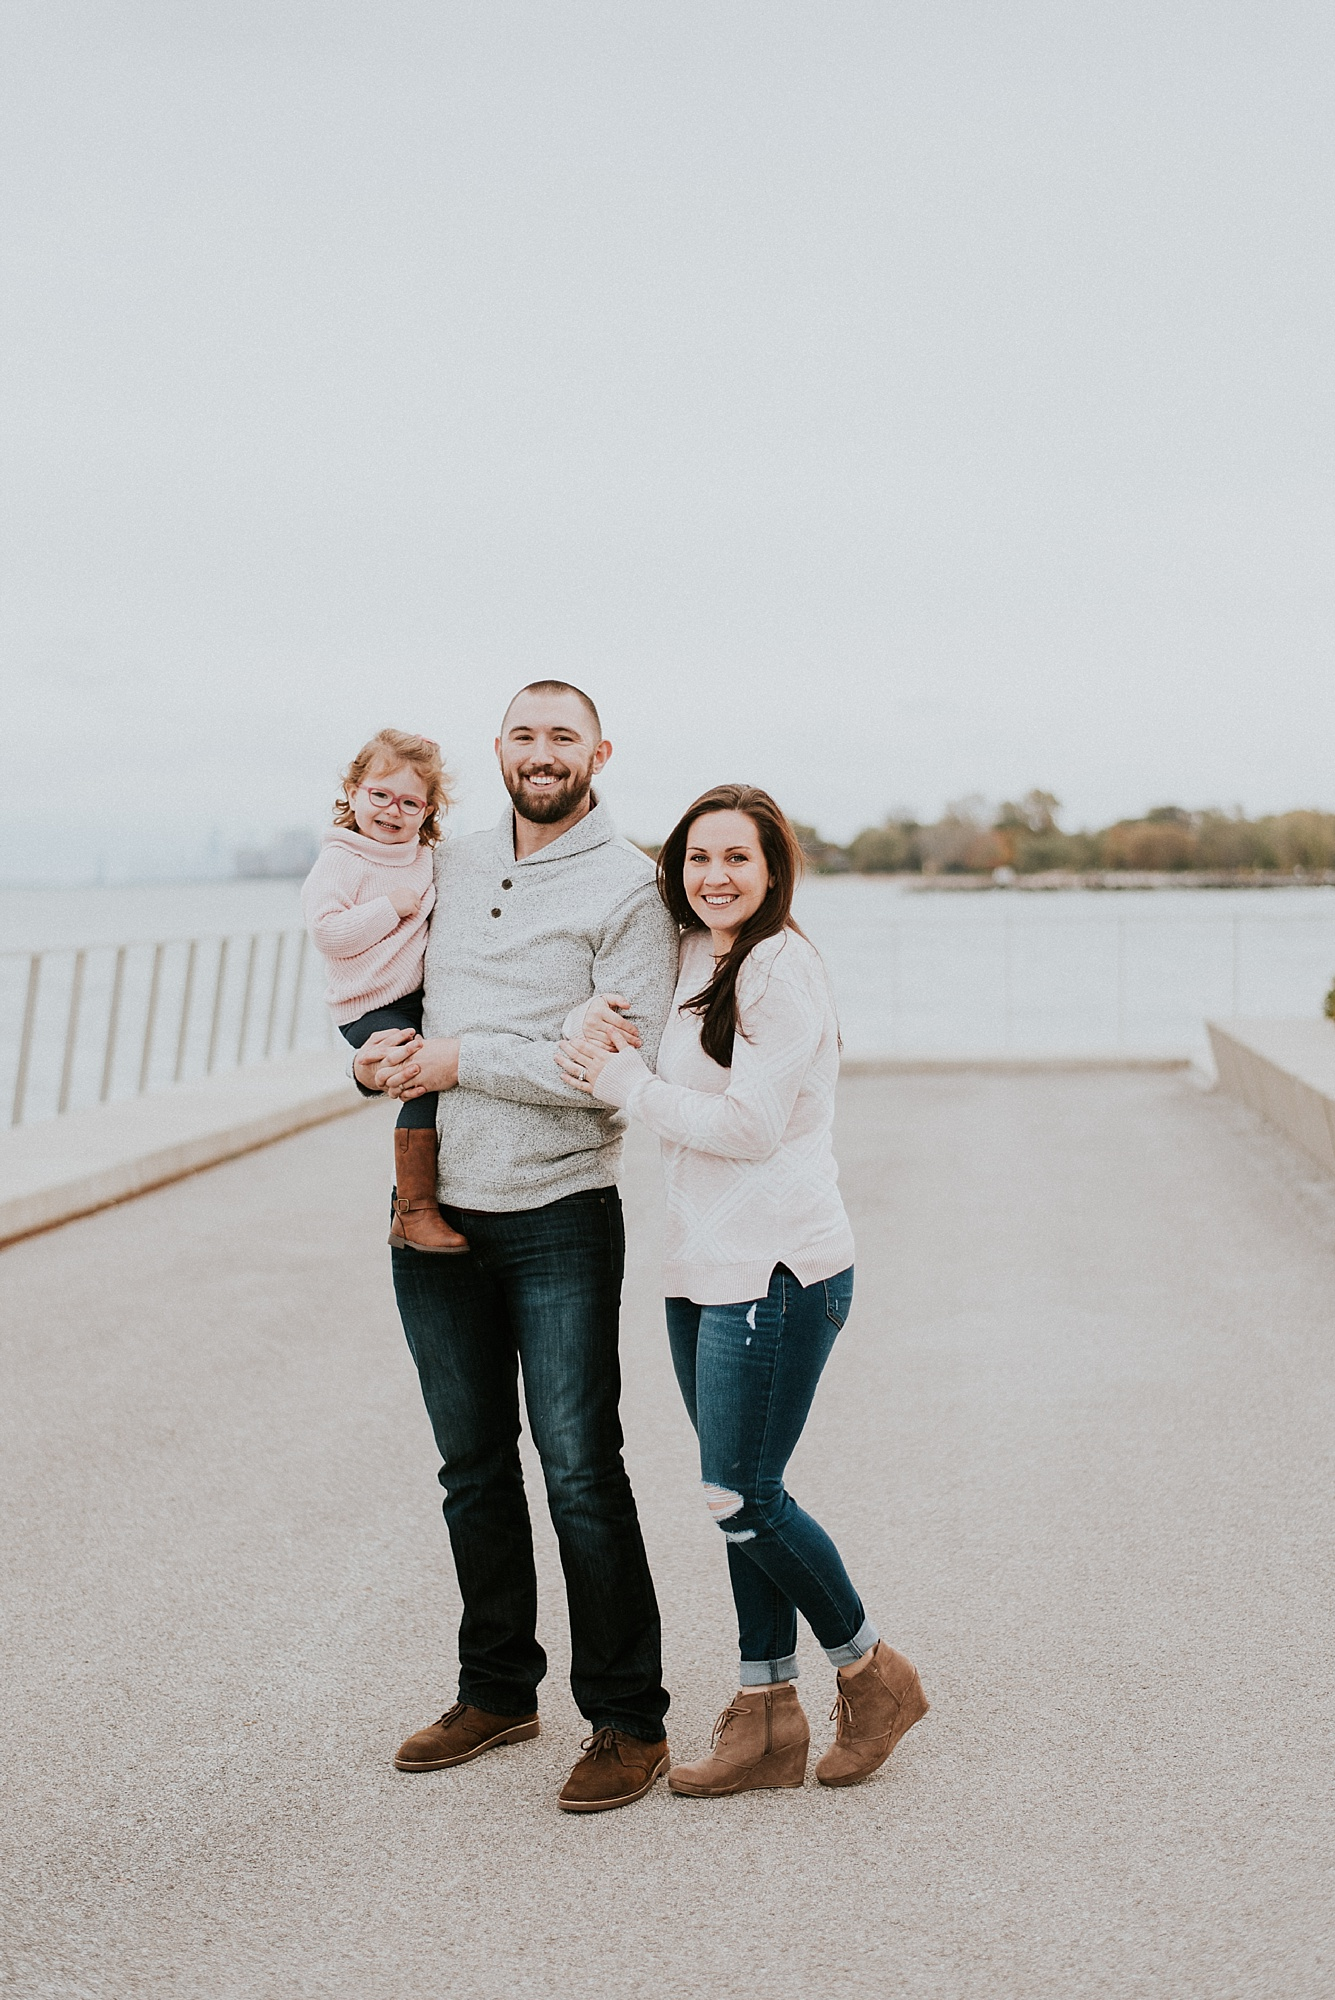 CHICAGO-MATERNITY-FAMILY-PHOTOGRAPHER-LISH-MARIE_0388.jpg